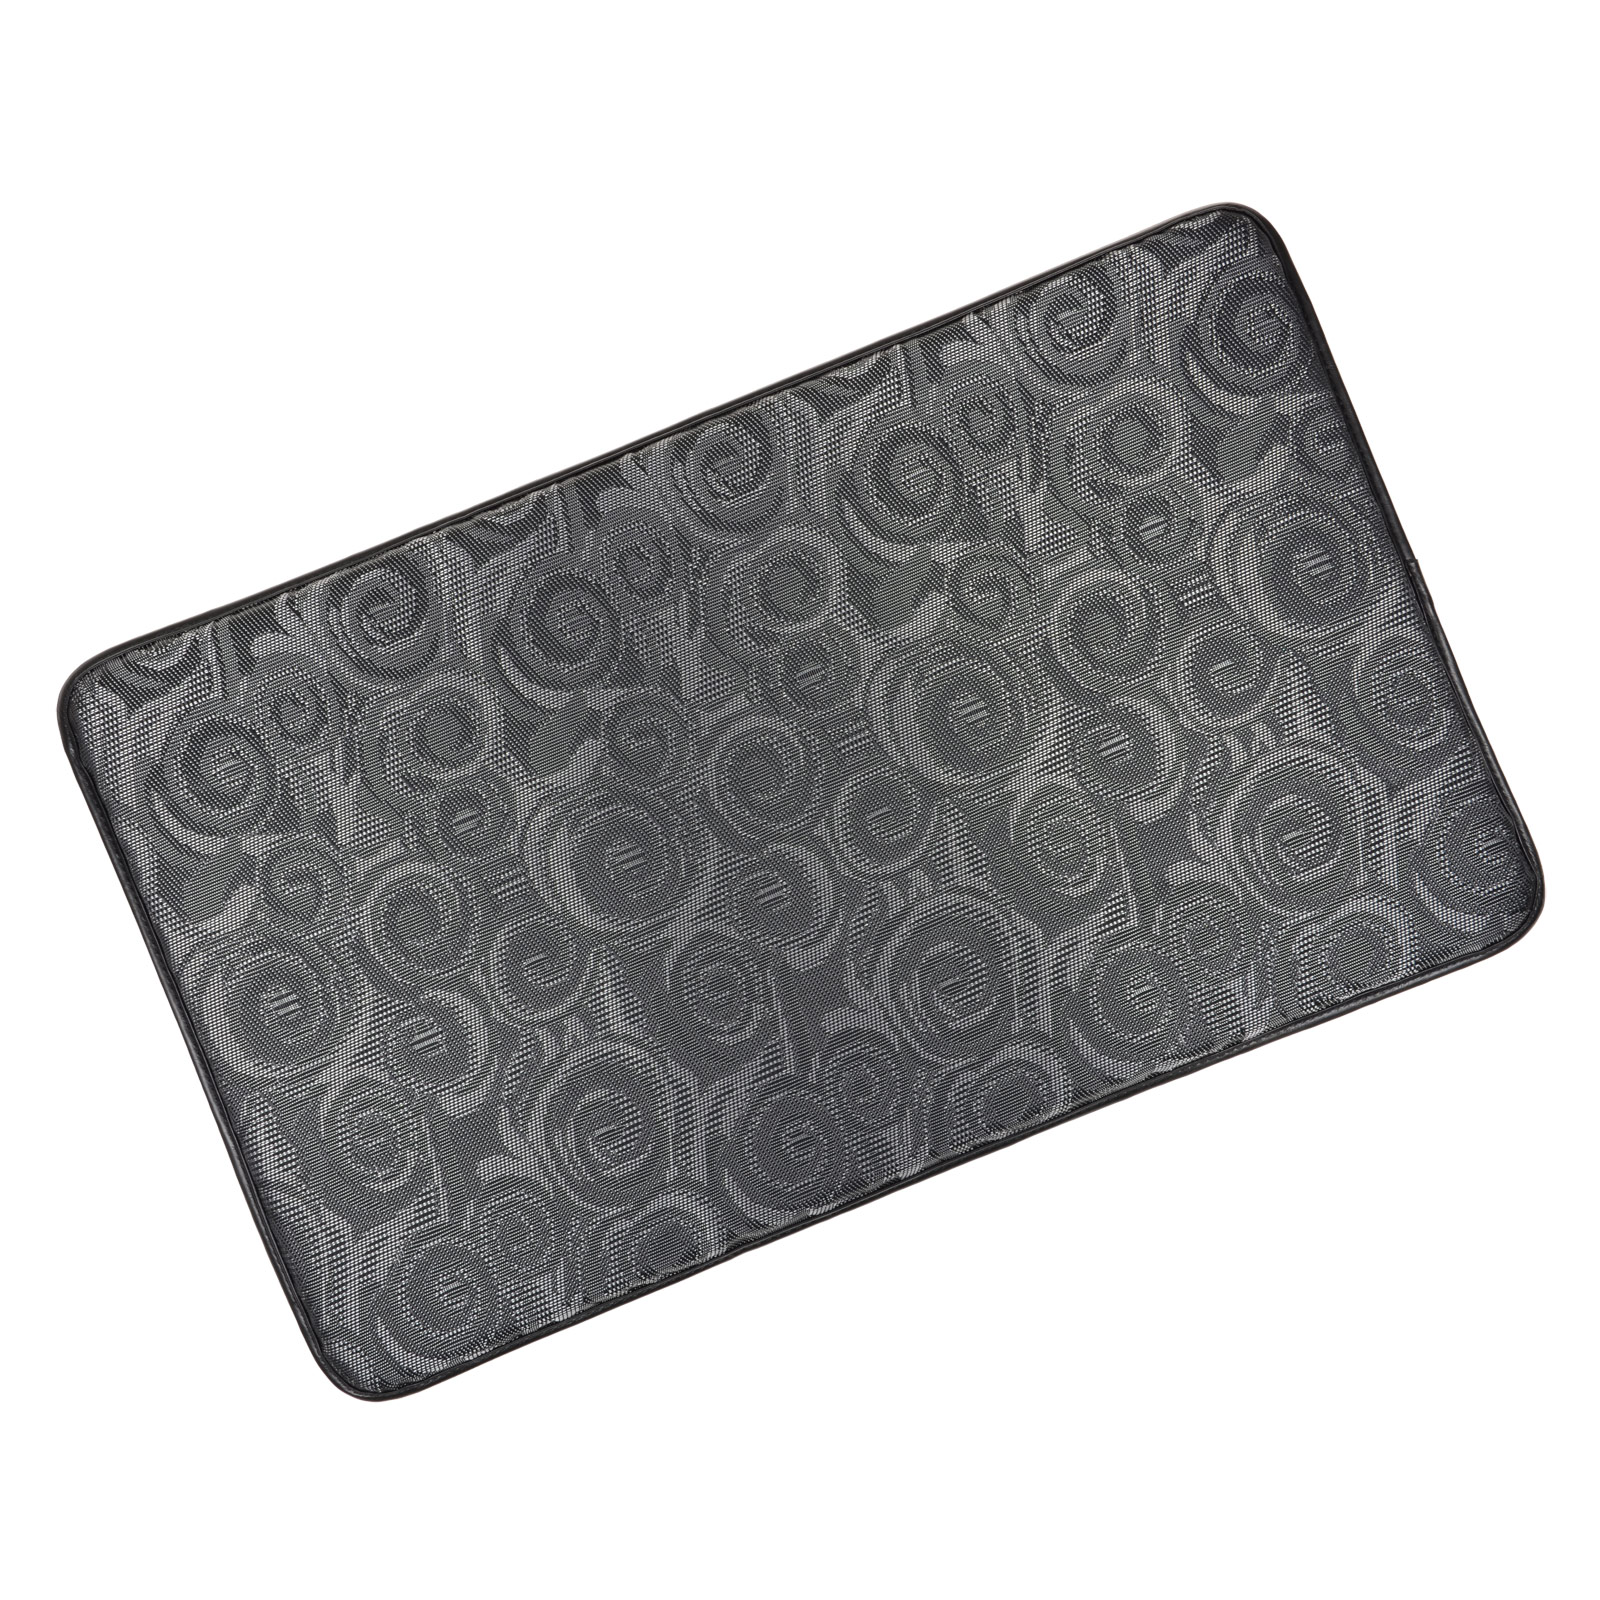 kitchen comfort floor mats imperial equipment 76 x 46cm micro pro memory foam anti fatigue home